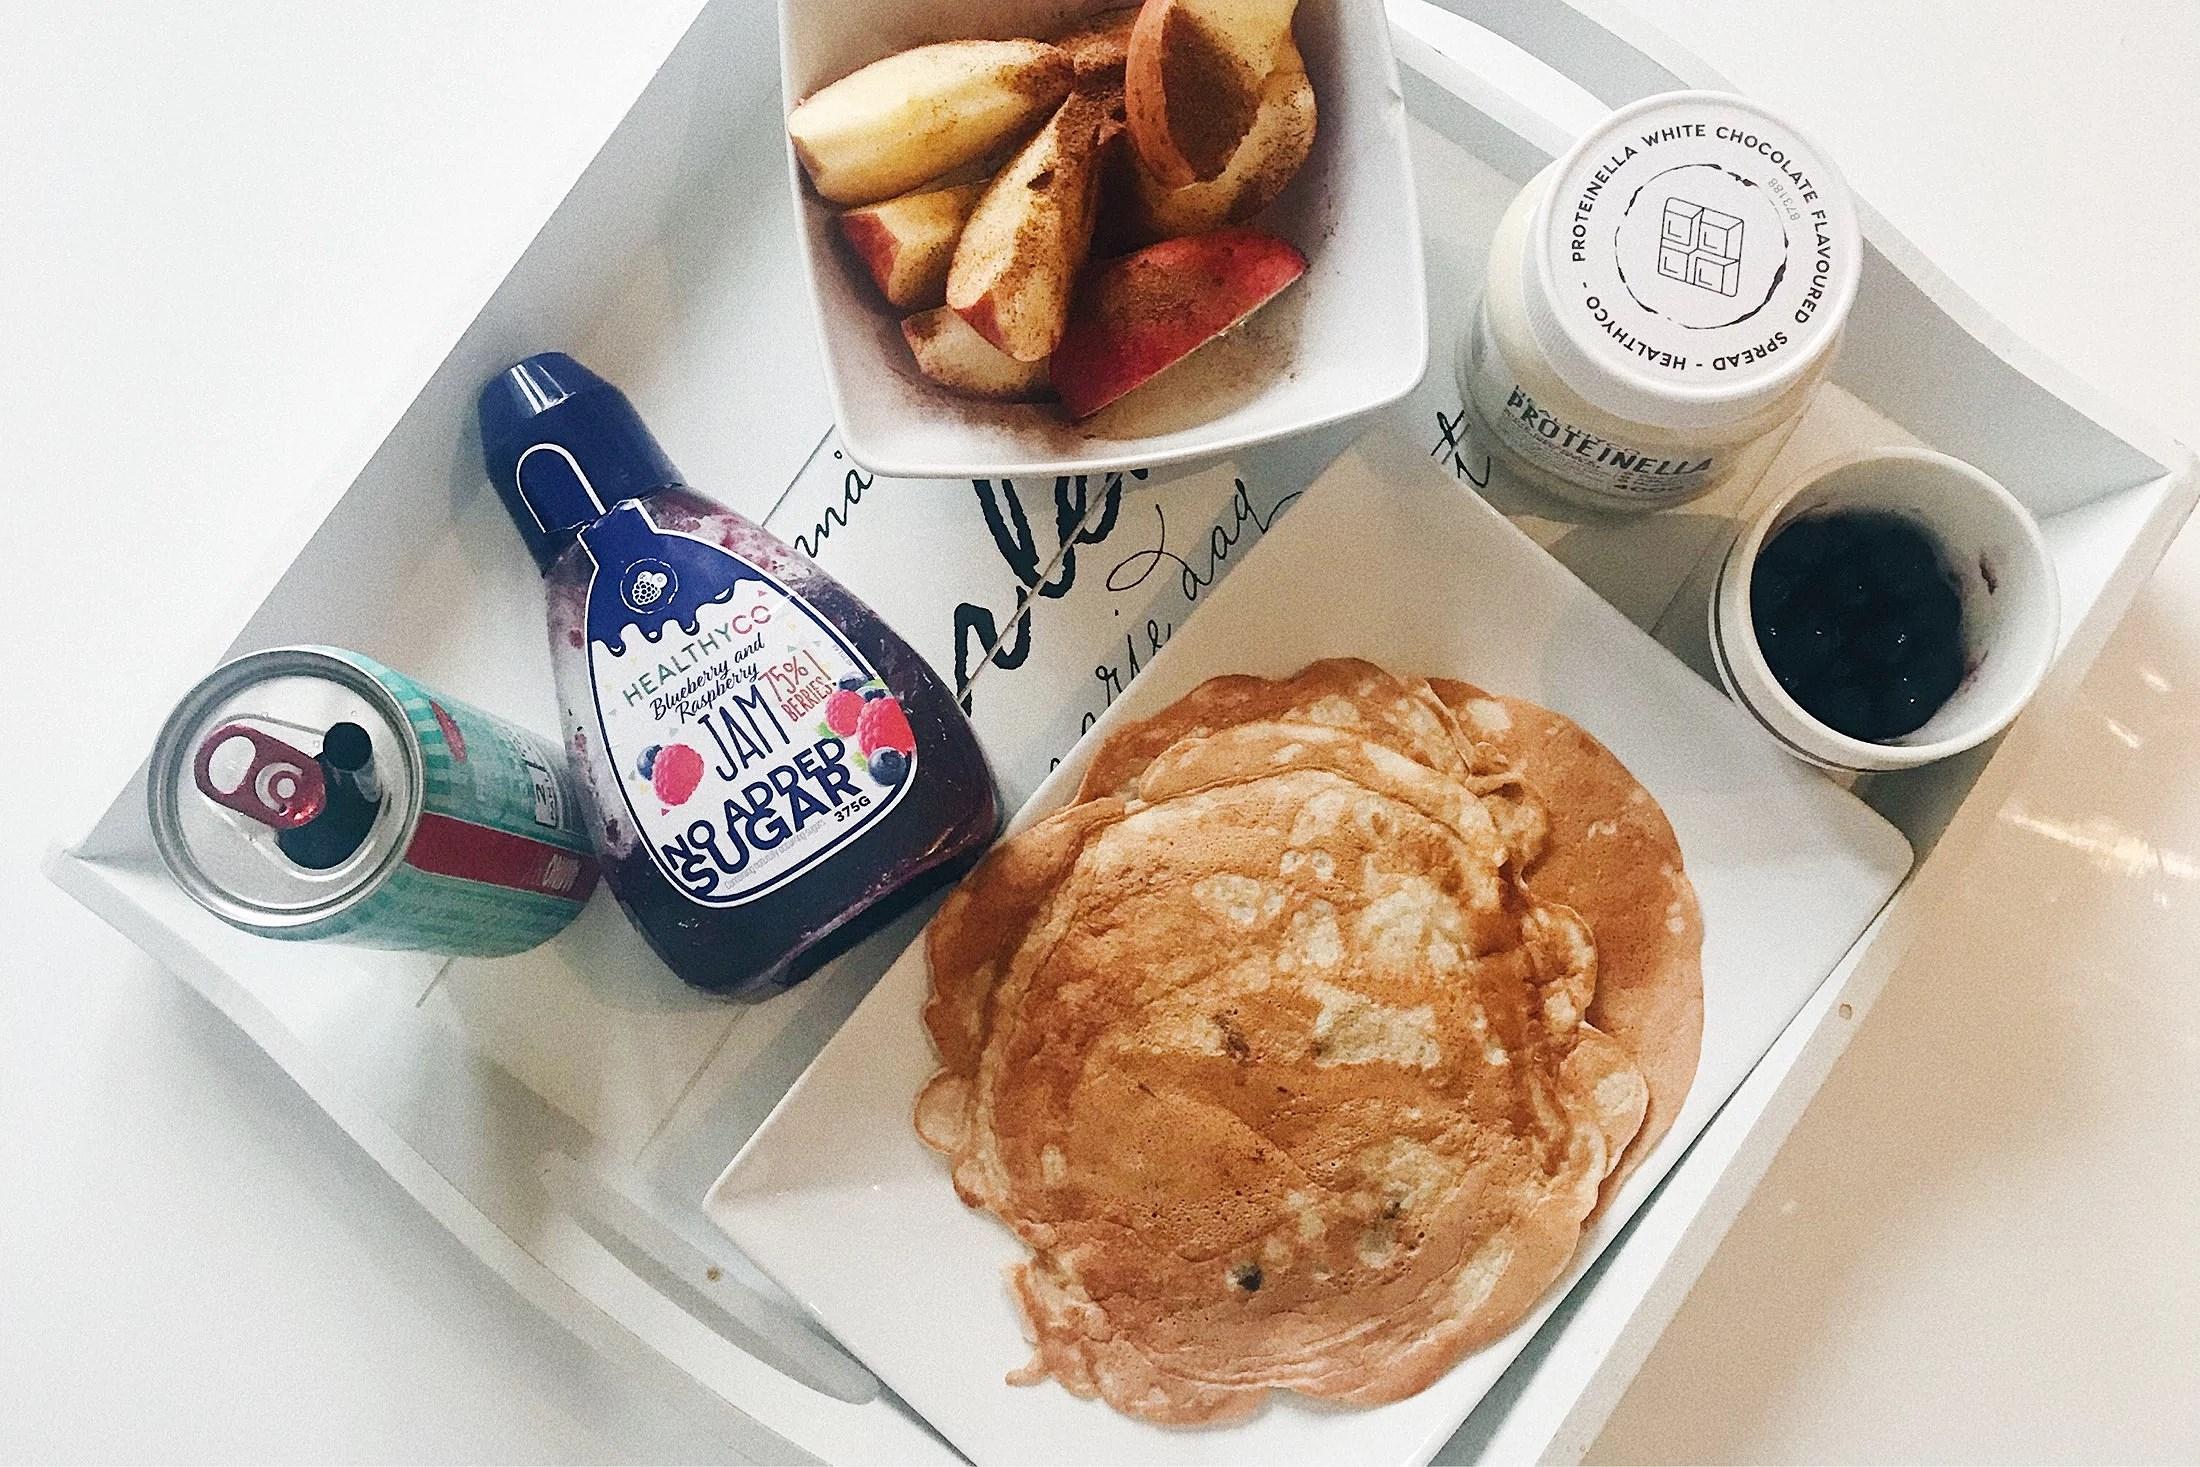 Lördagsfrukost en torsdag